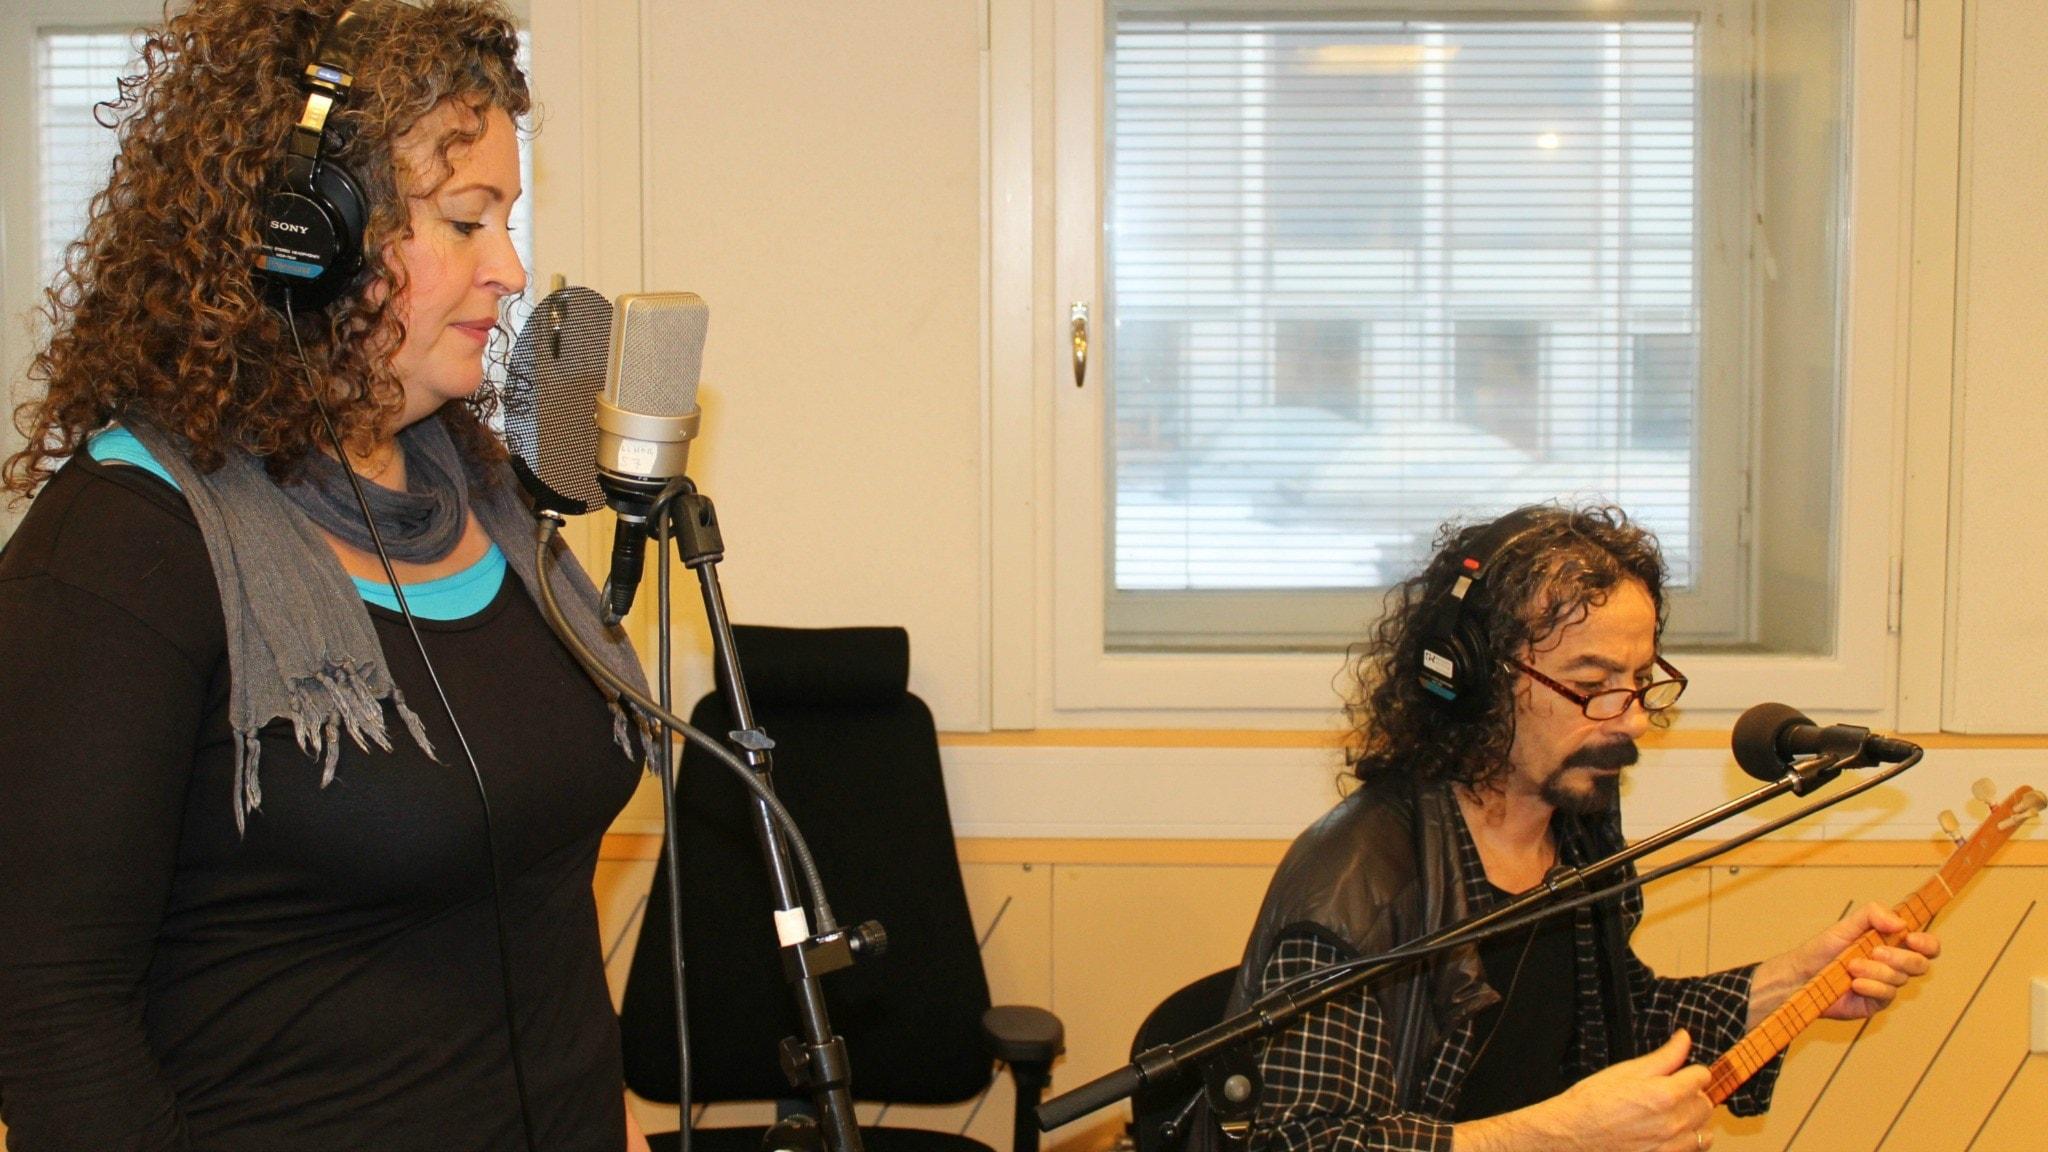 Burcu Ada och Kudret Dilik. Foto: Sveriges Radio